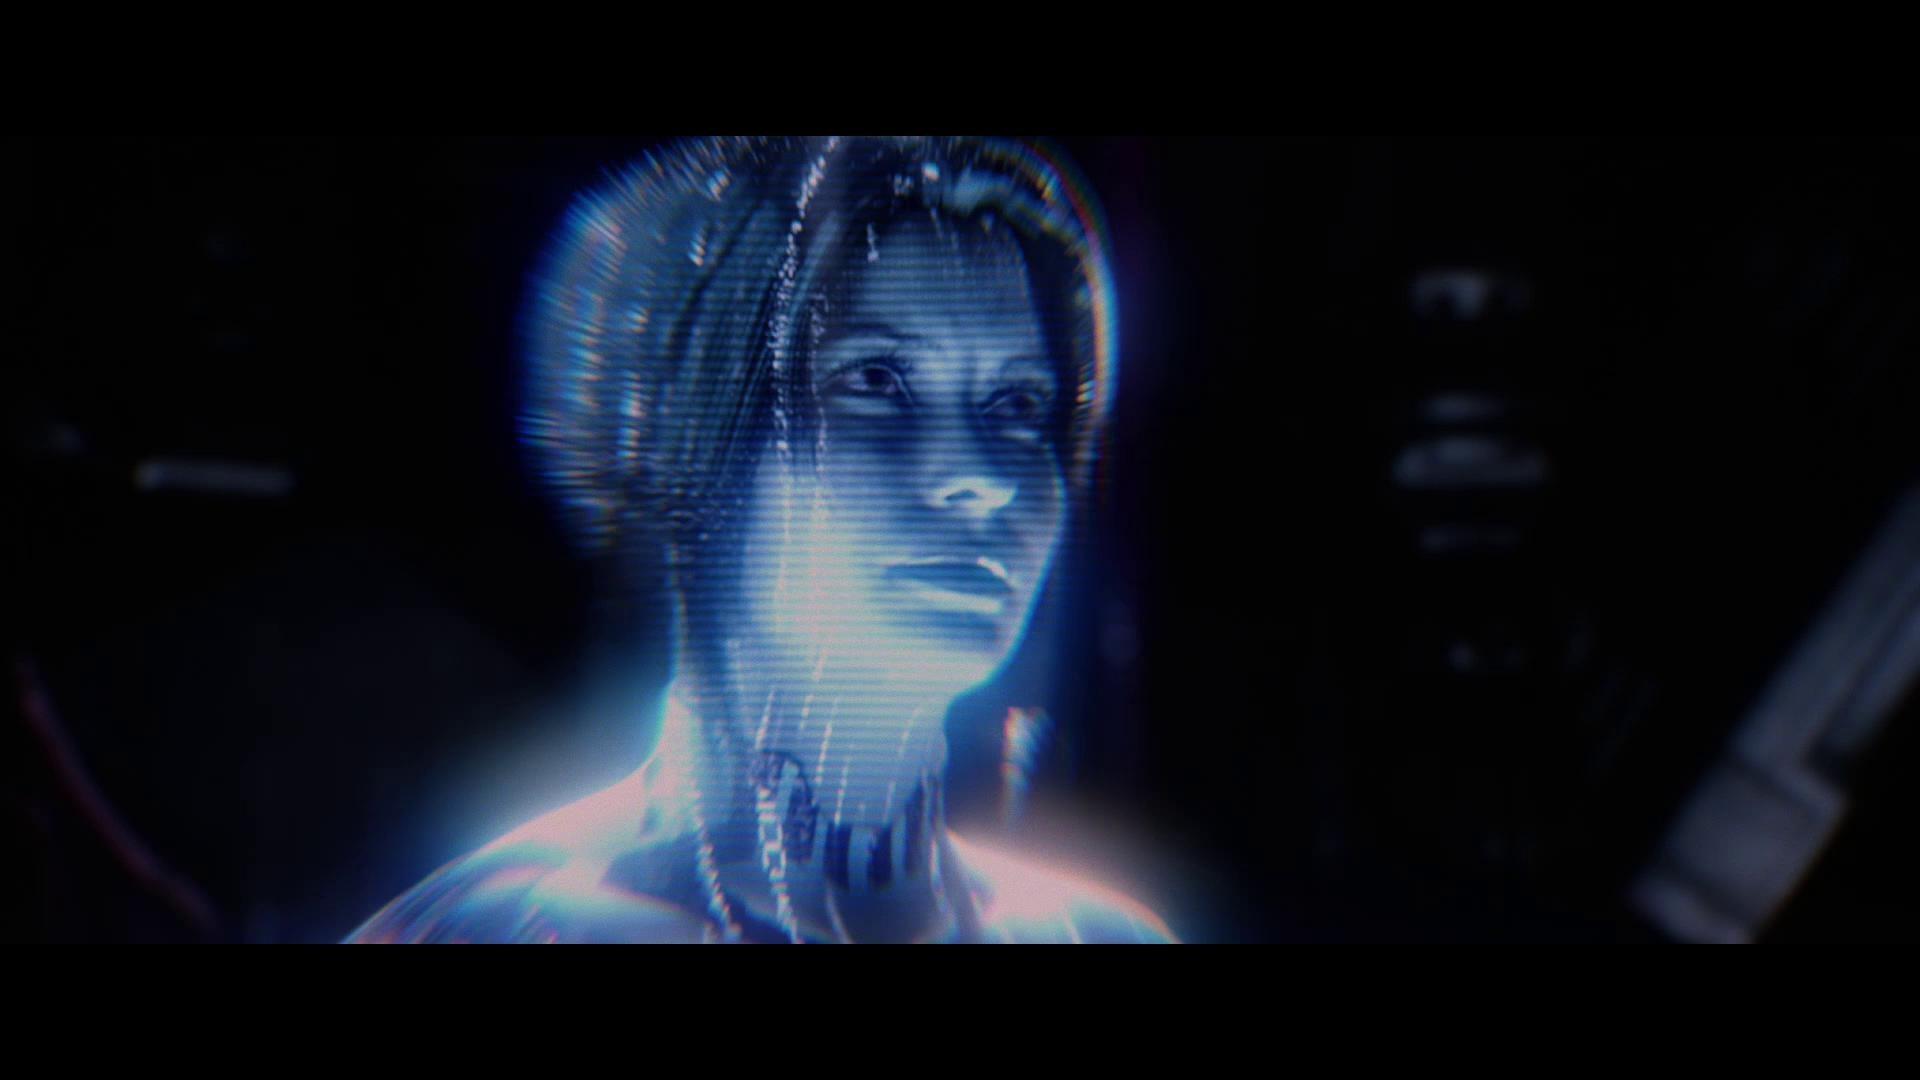 Cortana Hd Wallpapers 1080p 68 Images